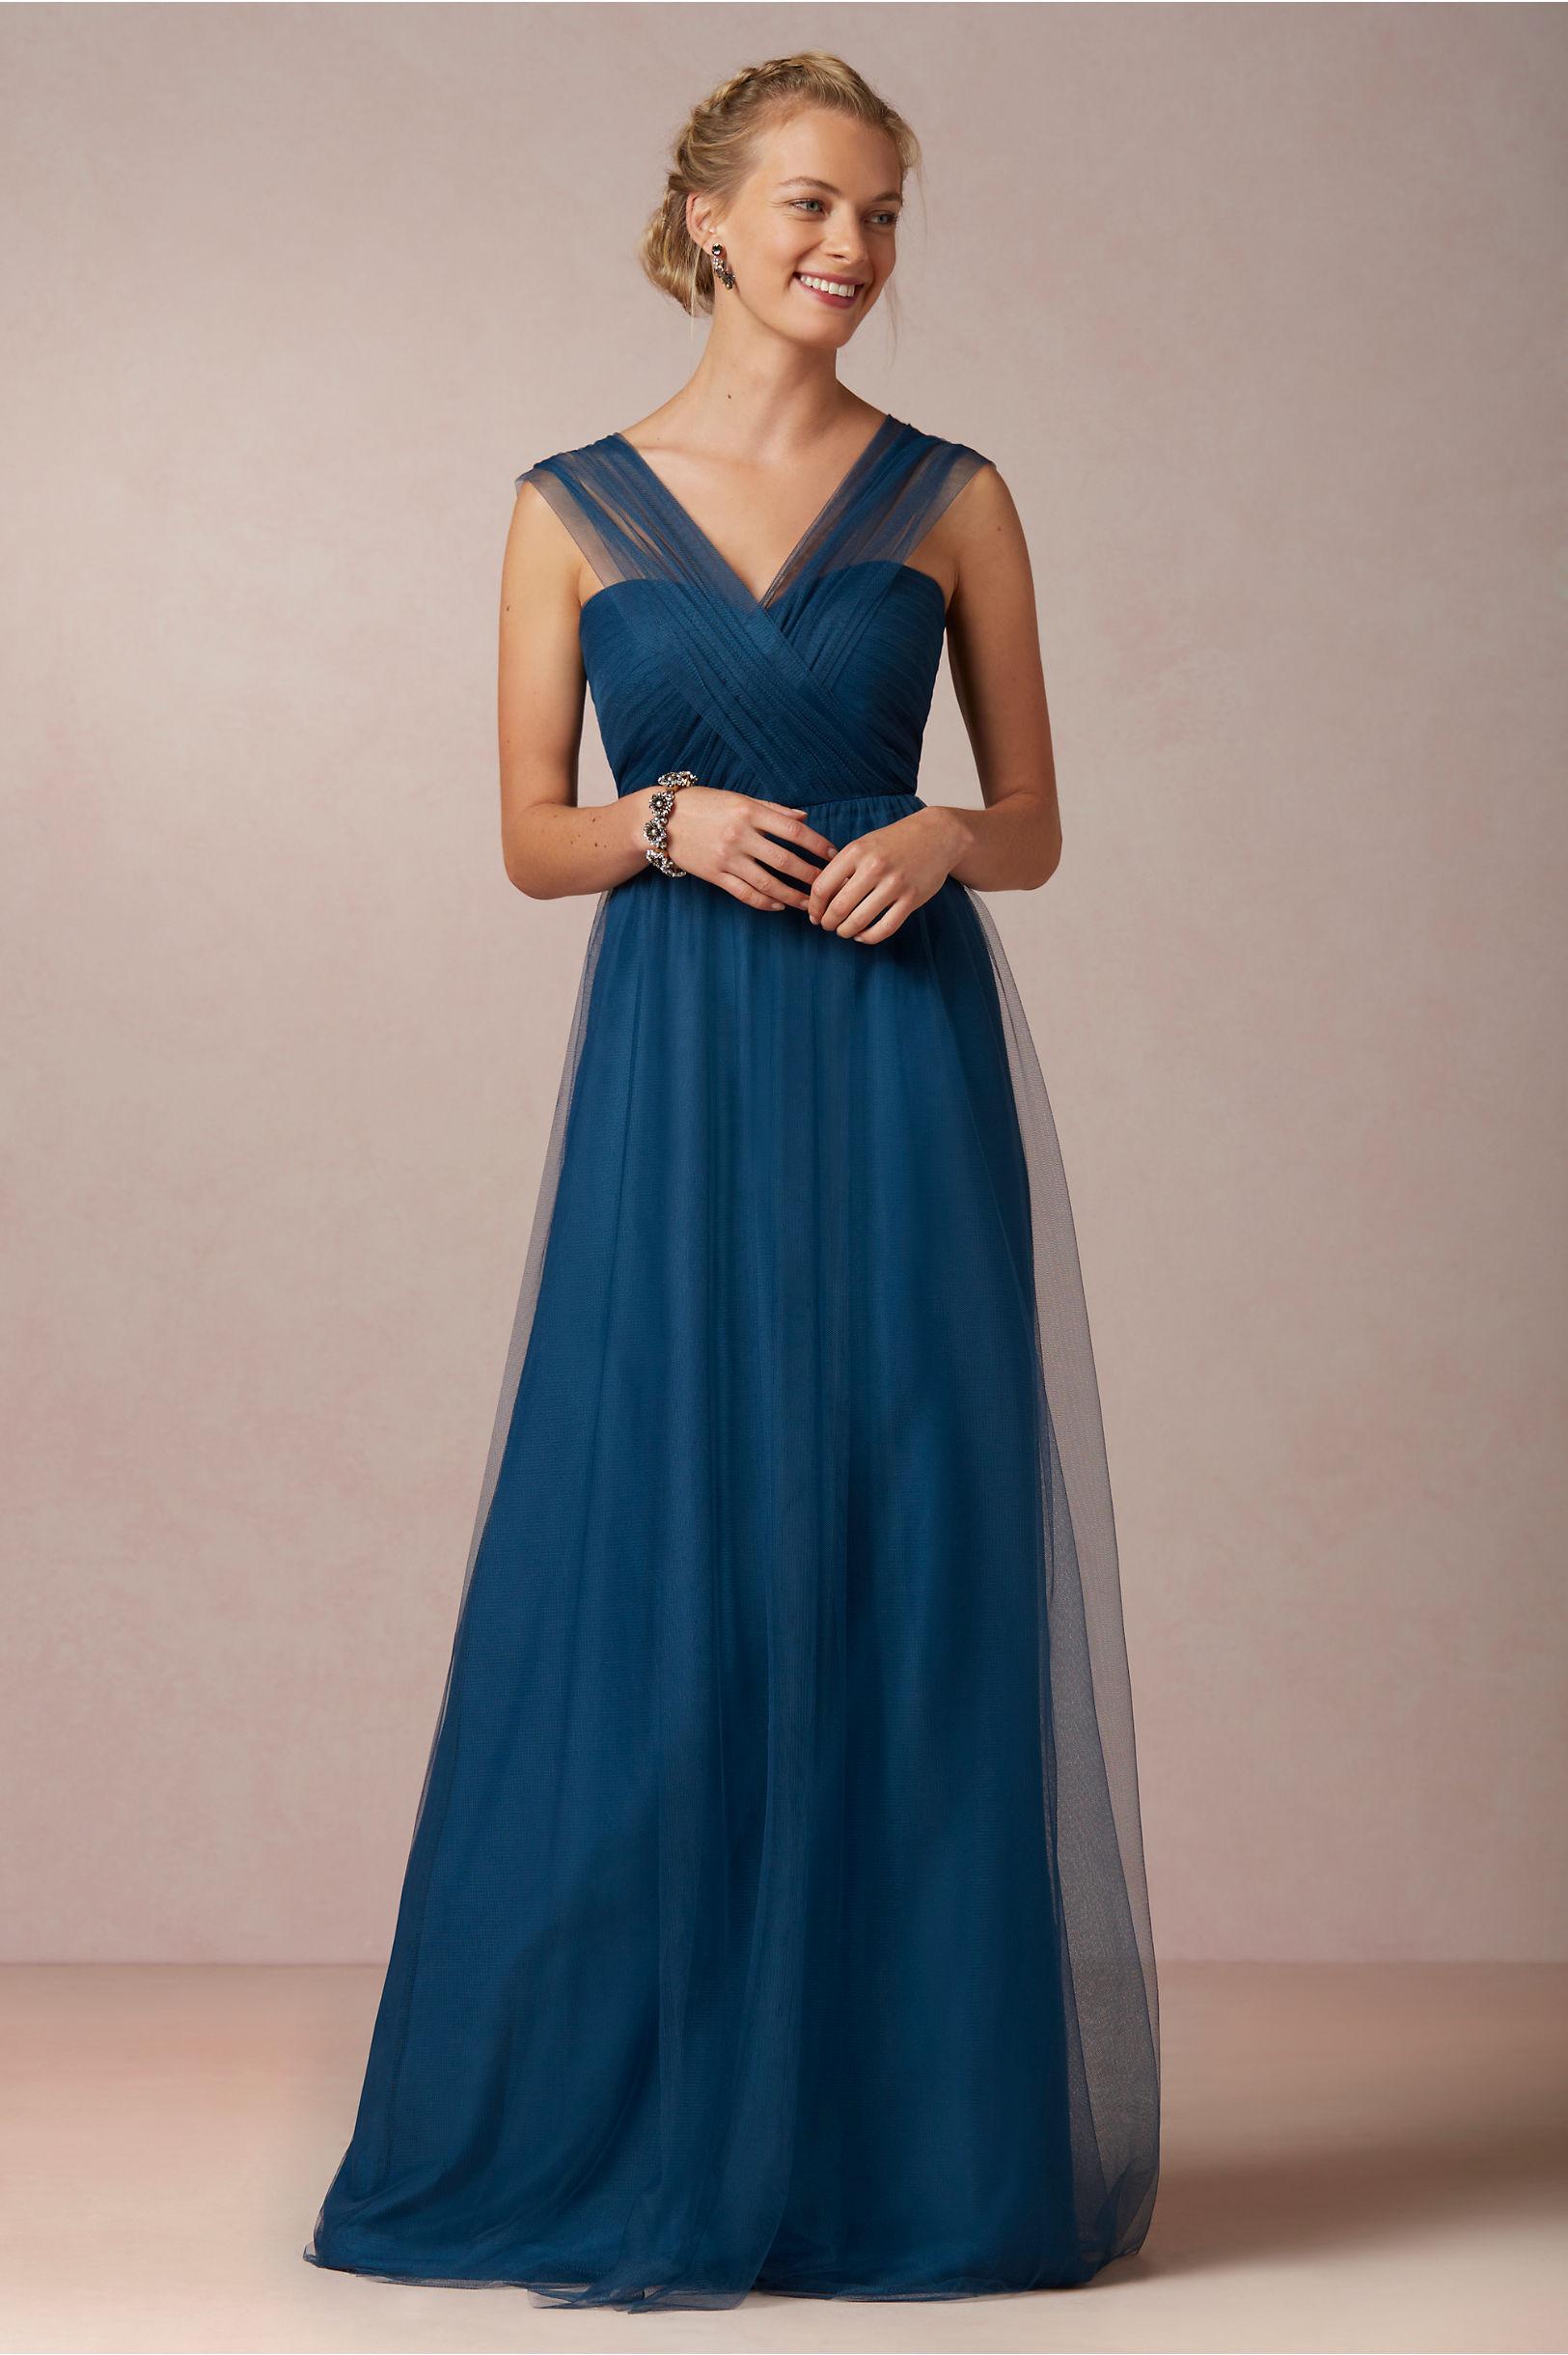 Annabelle dress in occasion dresses bhldn jenny yoo lapis blue annabelle dress bhldn ombrellifo Images